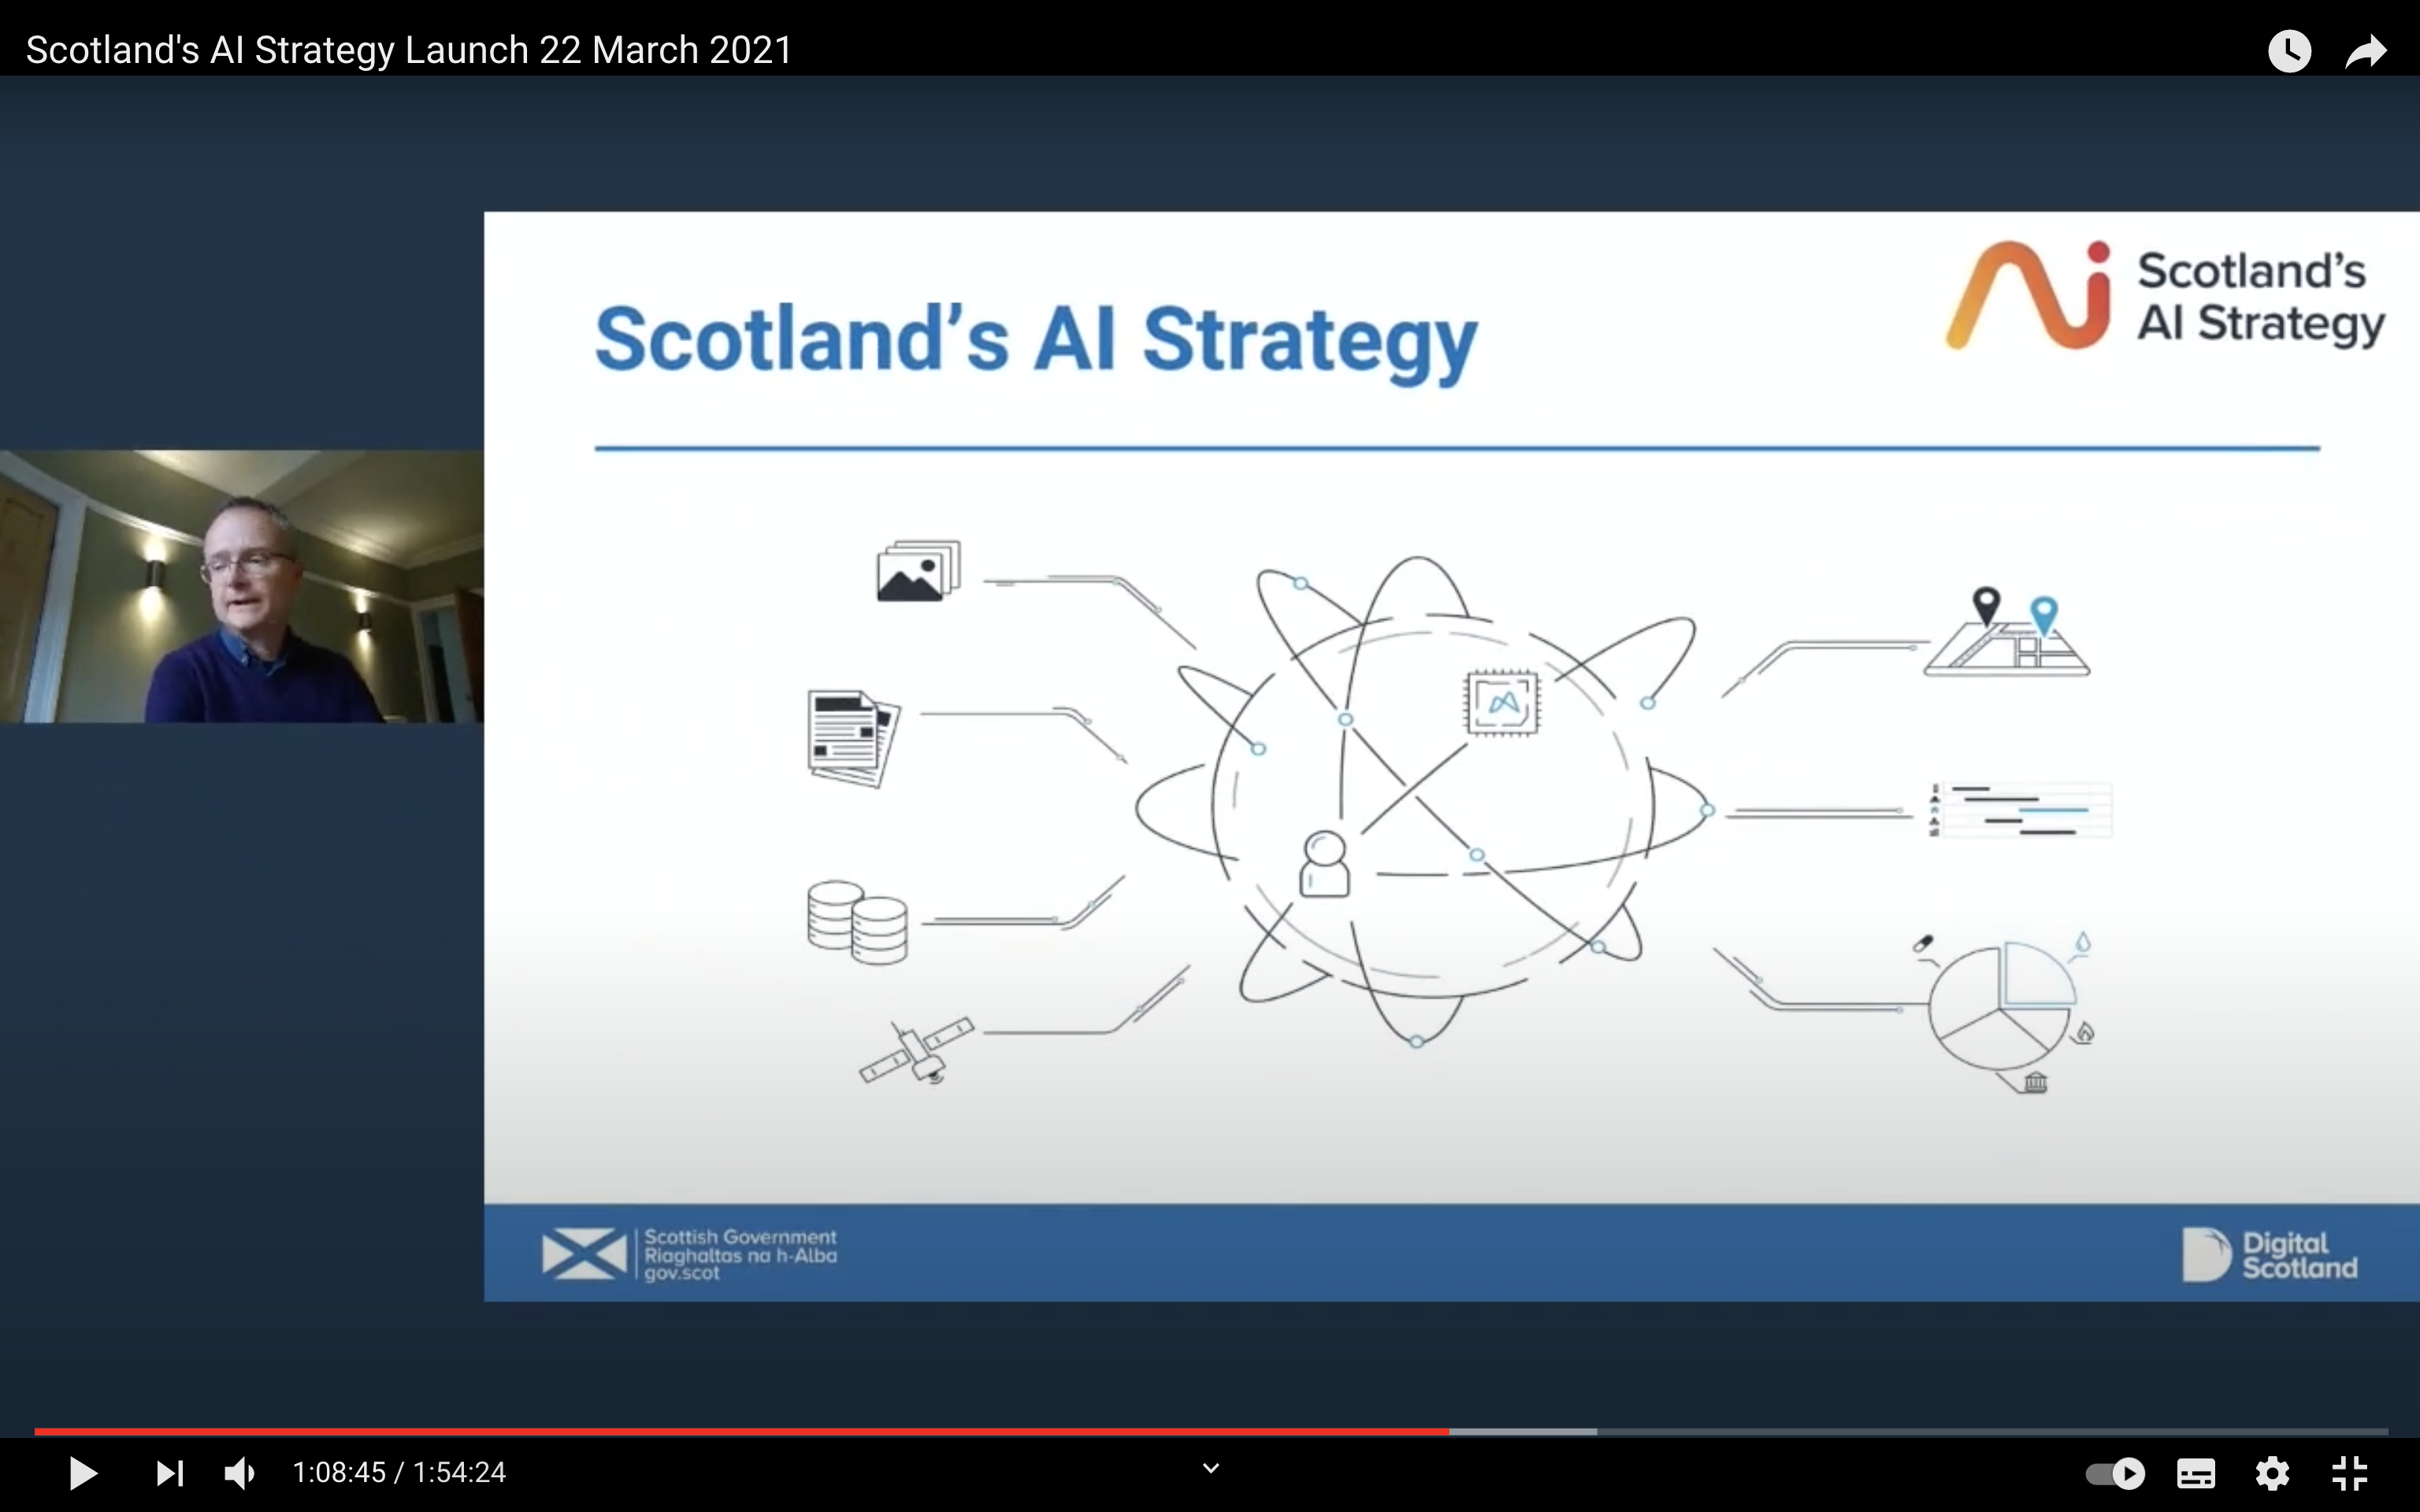 Scotland's AI Strategy